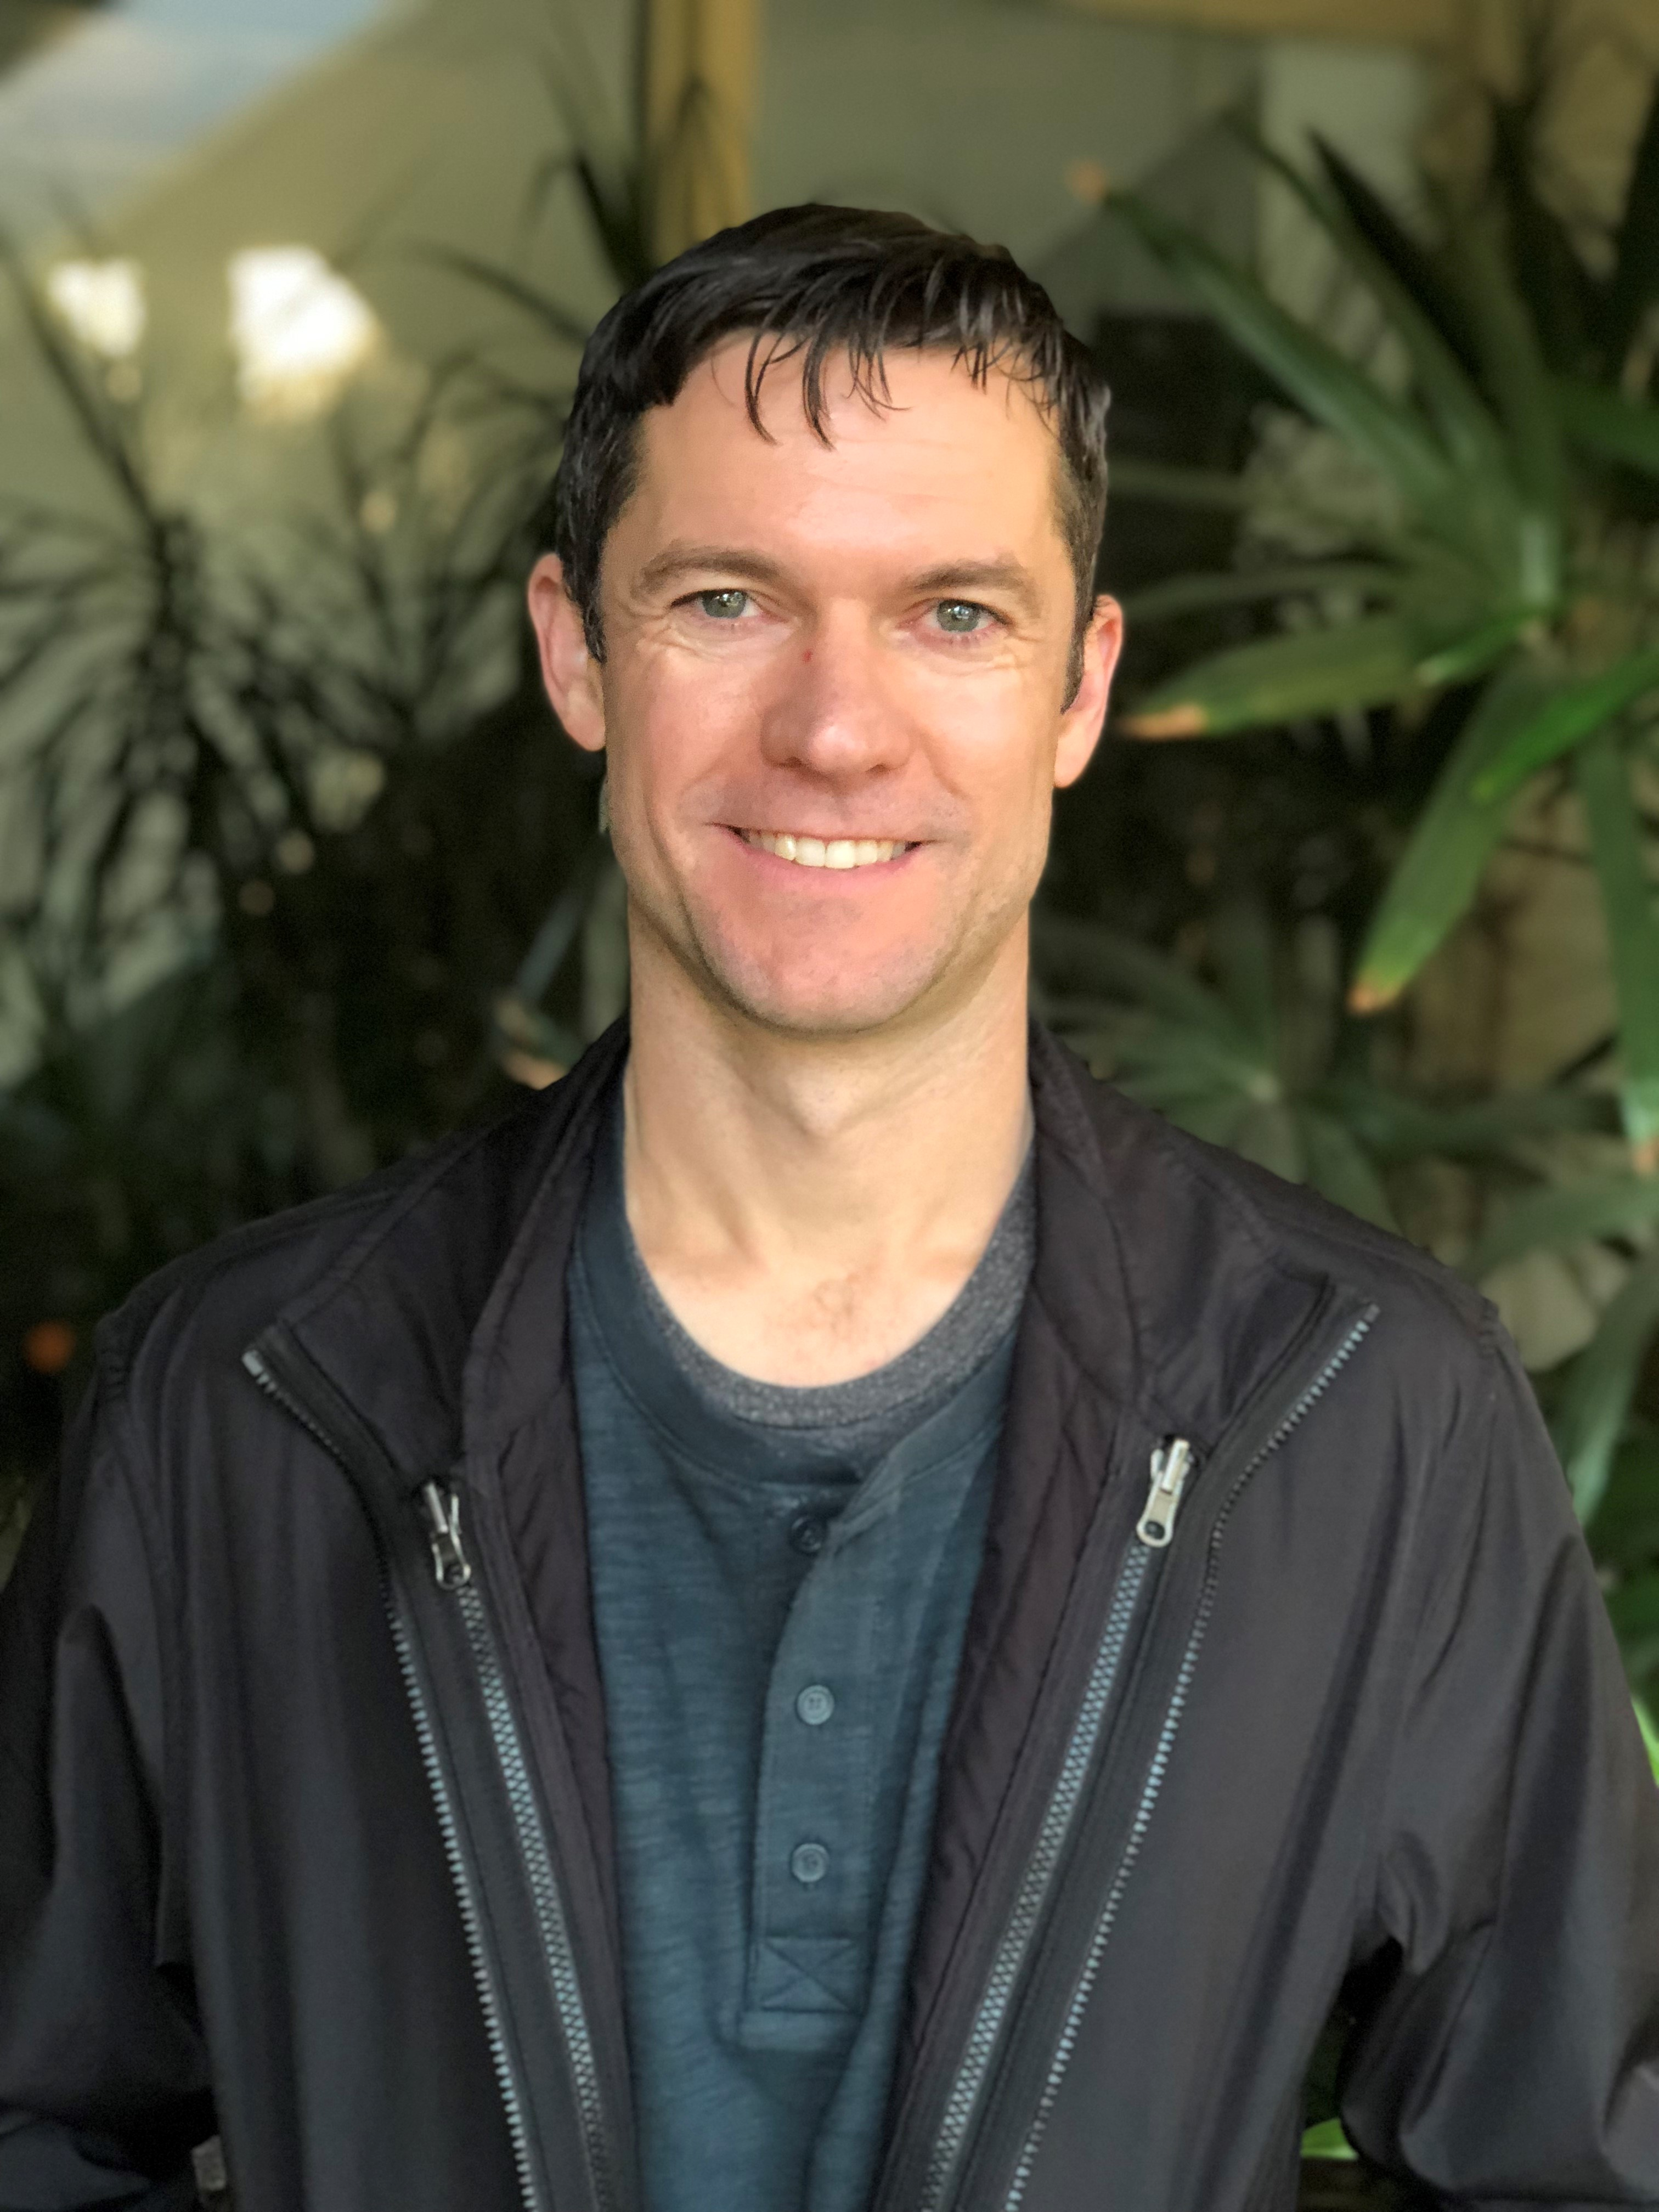 MIKE LOCKE - Vice president - Creative Synchronization & Marketing